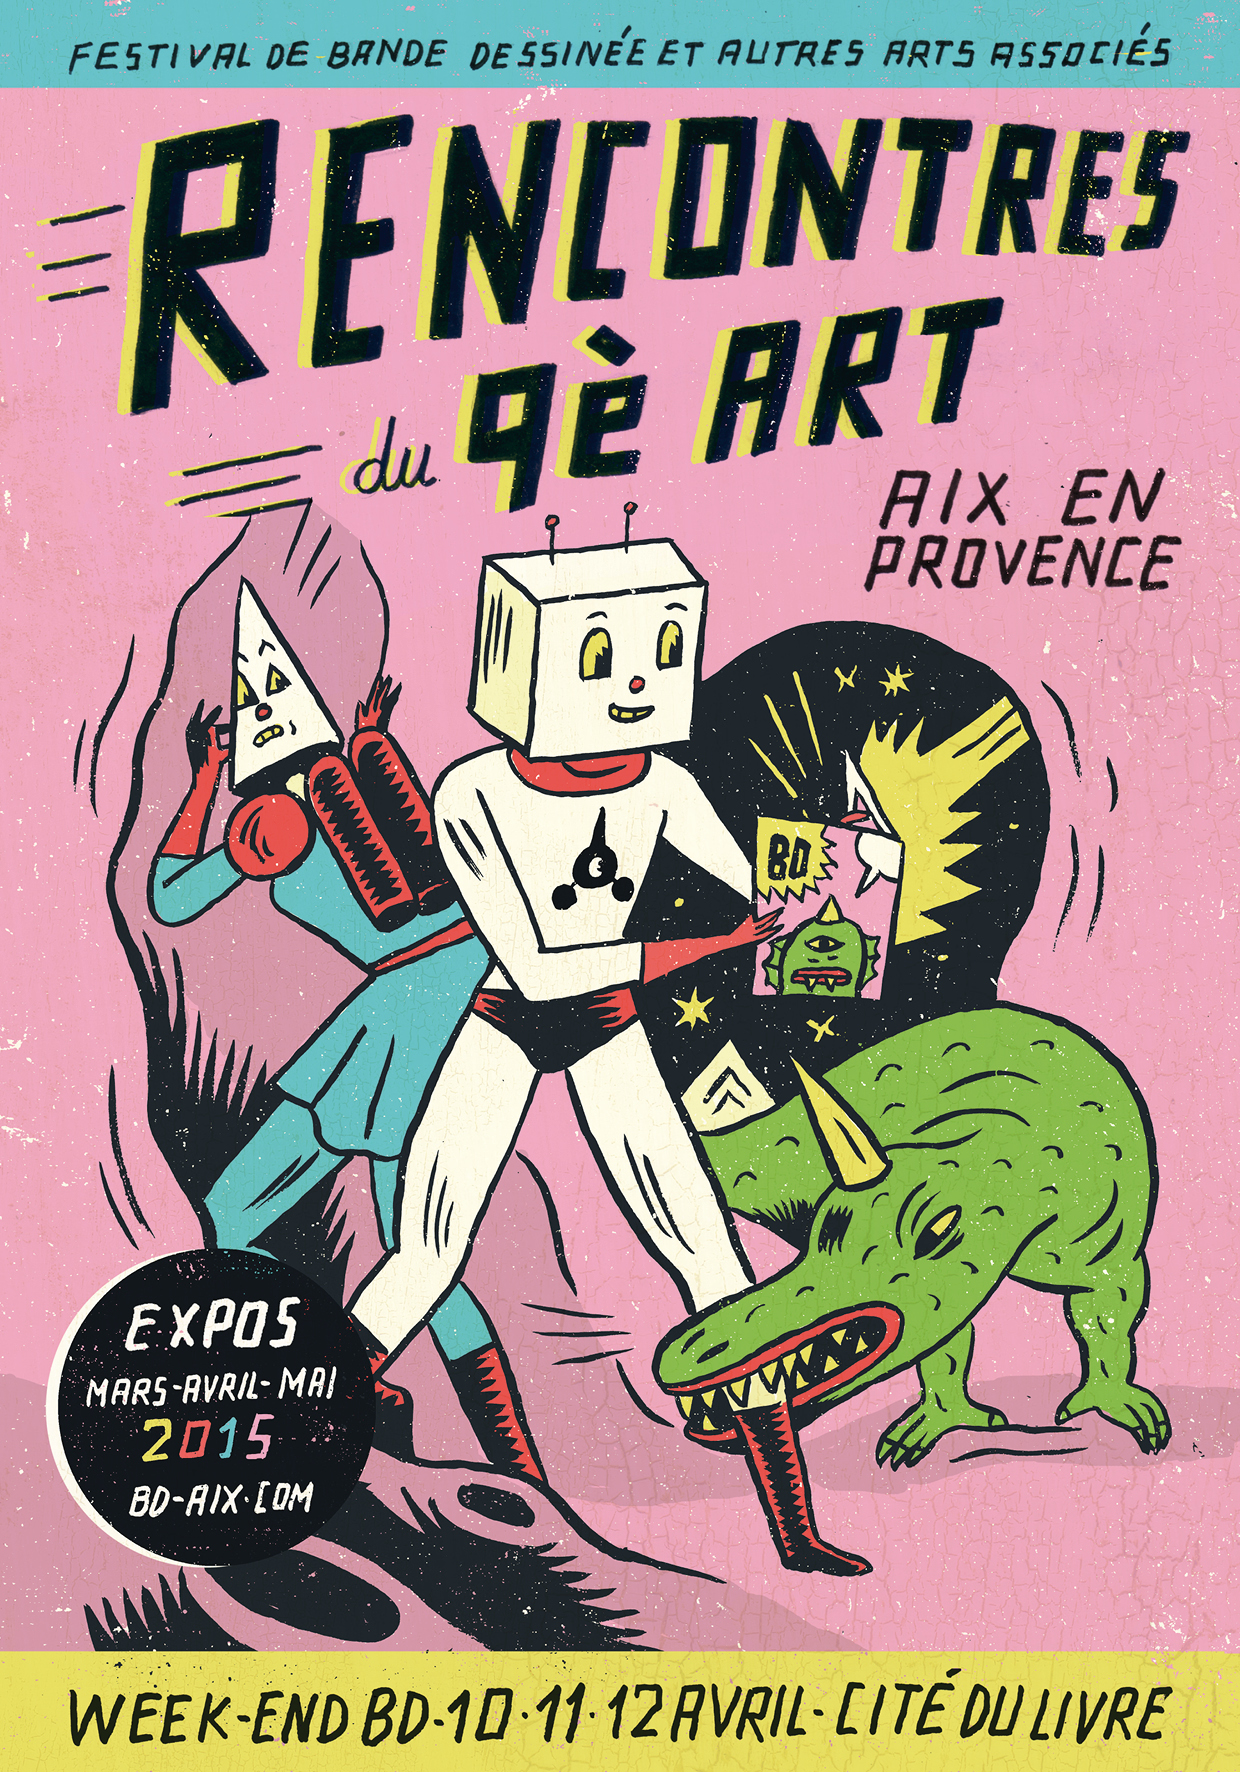 CARTES_Rencontres 9ème Art3